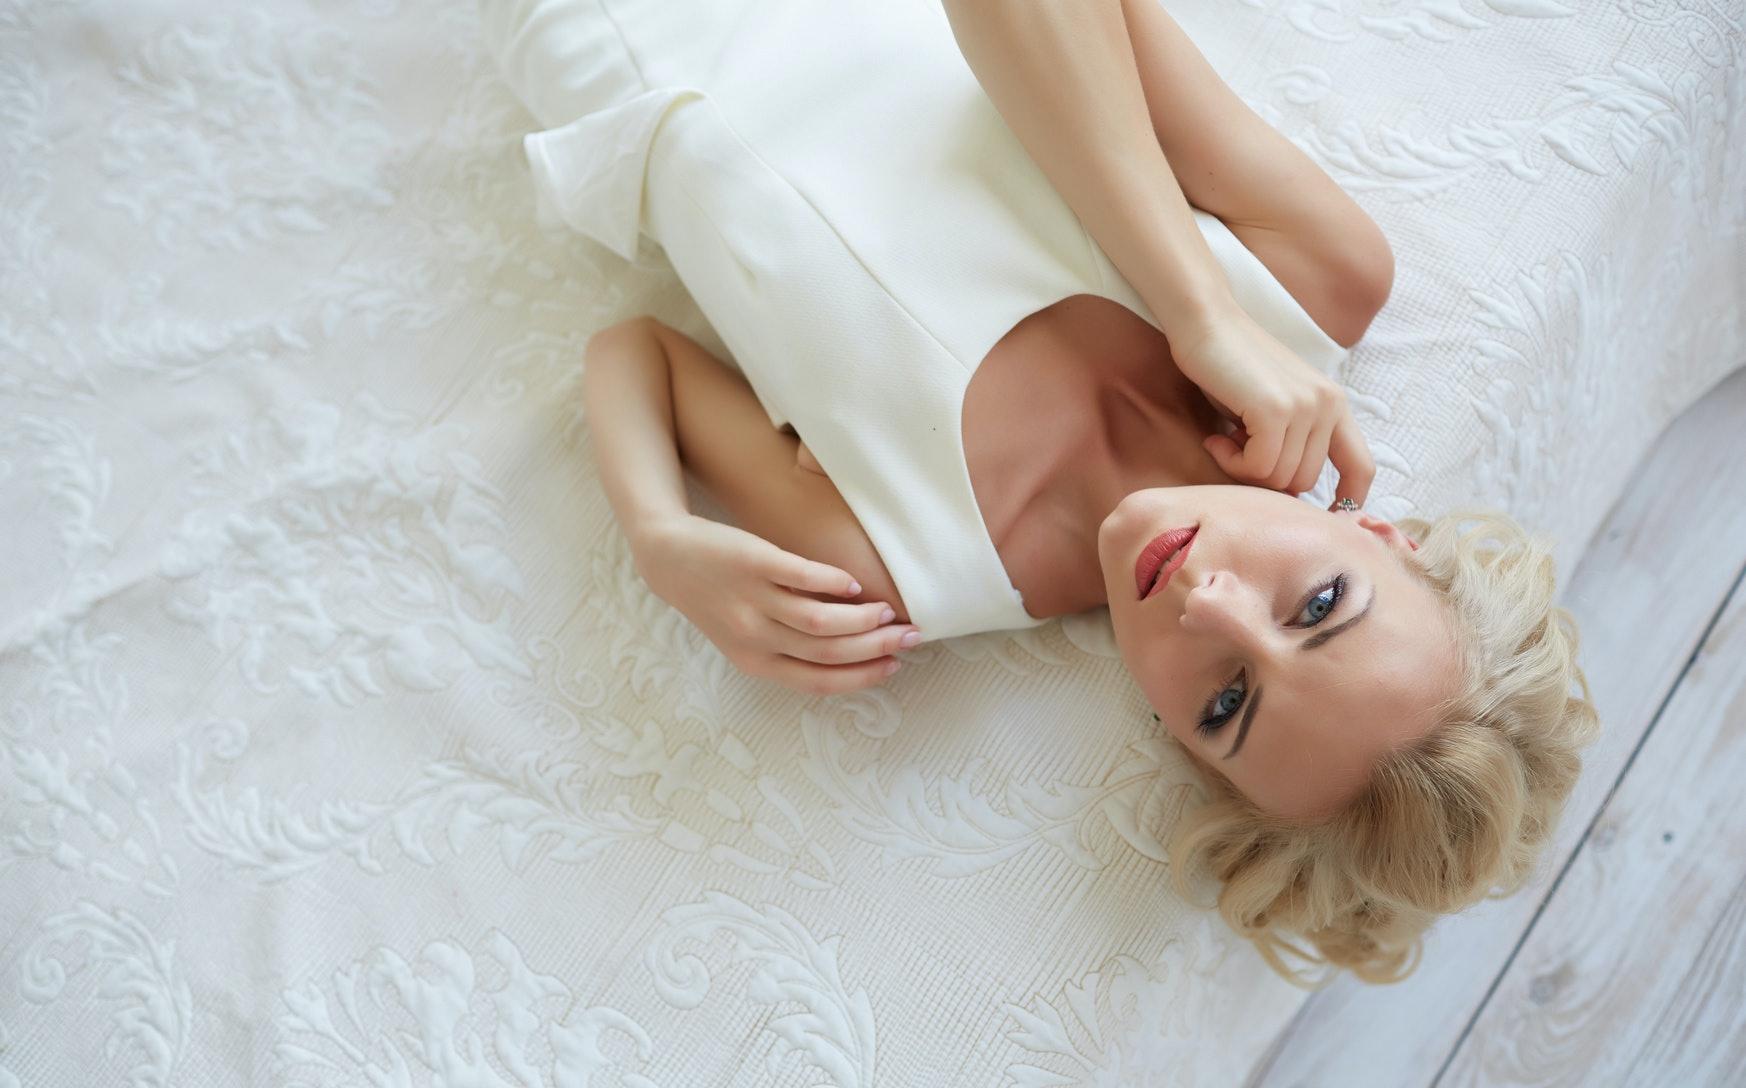 Fantine dress white stuff around clitorious.